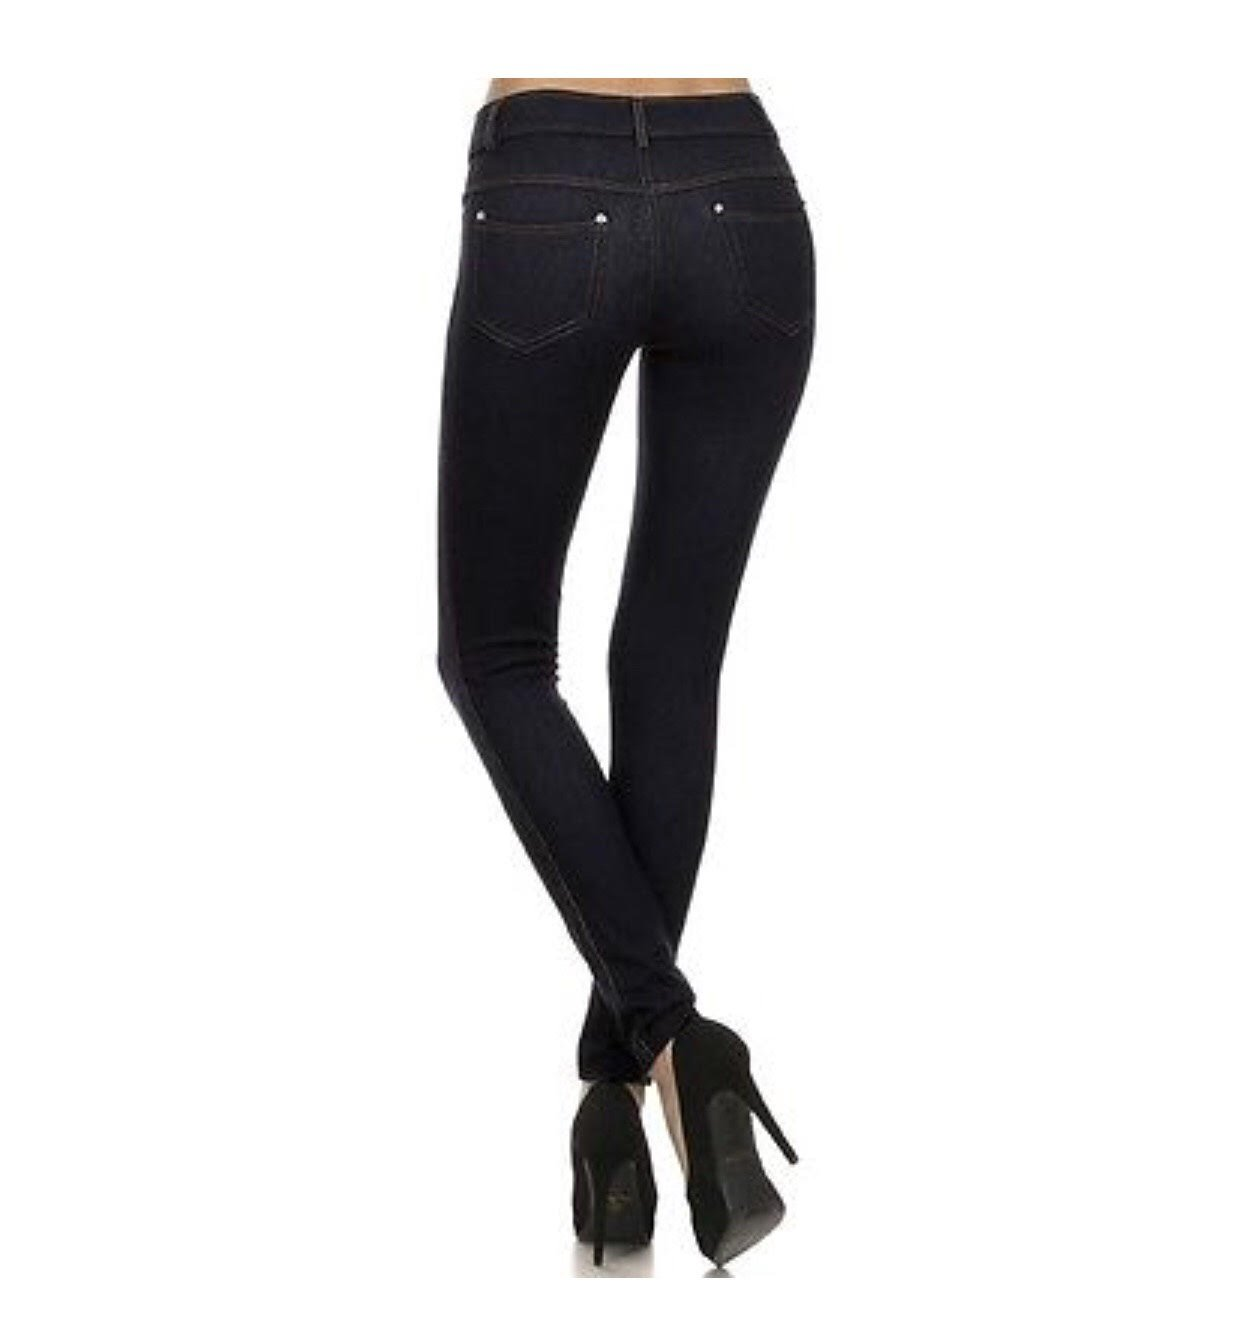 Yelete Womens Basic Five Pocket Stretch Jegging Tights Pants, Black, Medium